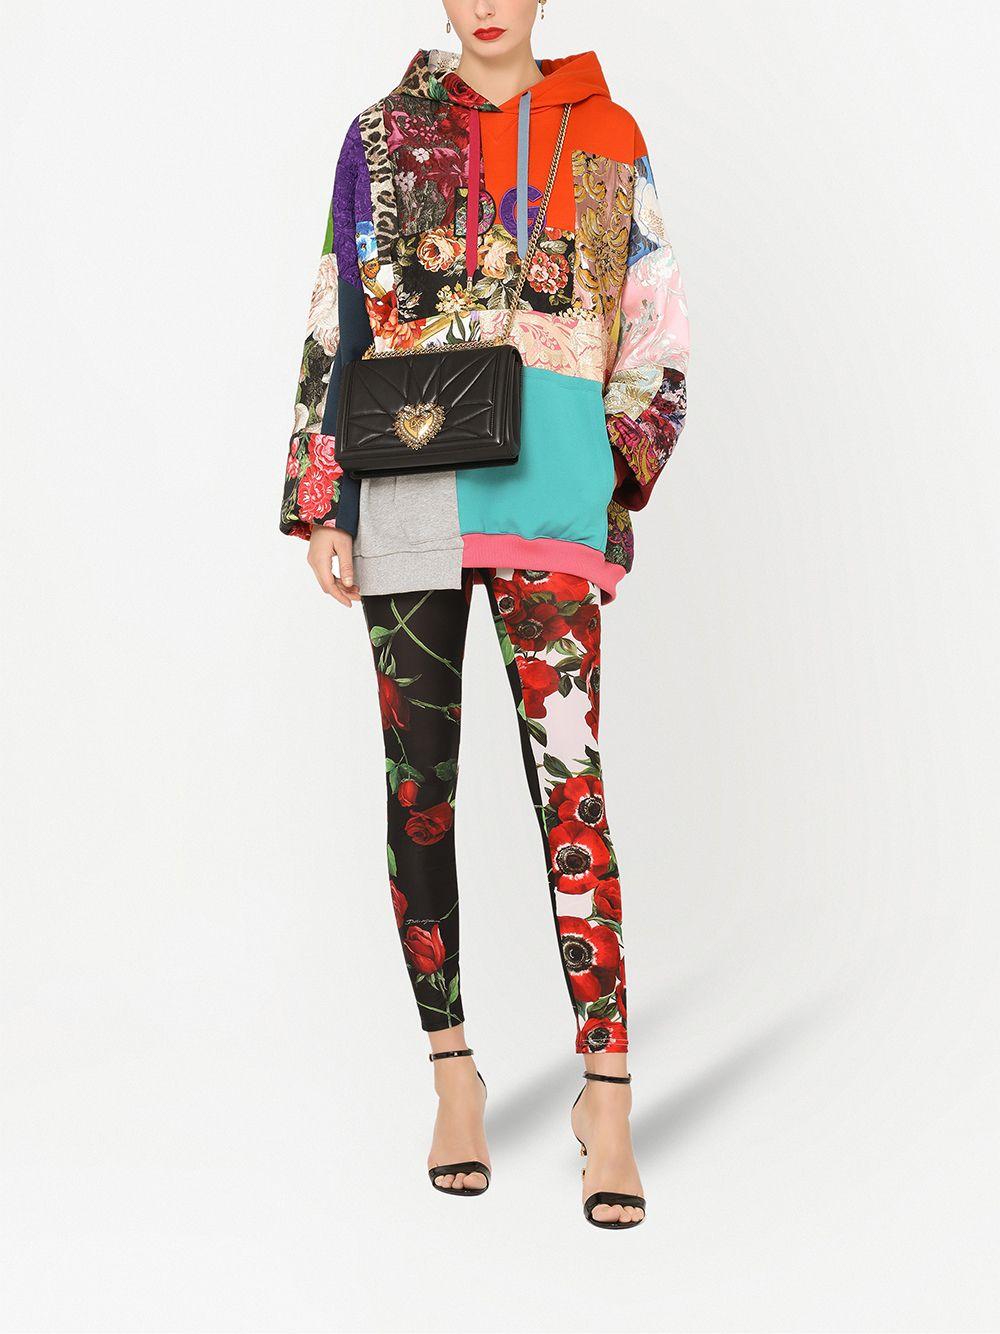 Pantaloni in stampa floreale patchwork multicolore DOLCE & GABBANA   Pantaloni   FTB1IT-GDX85S9000